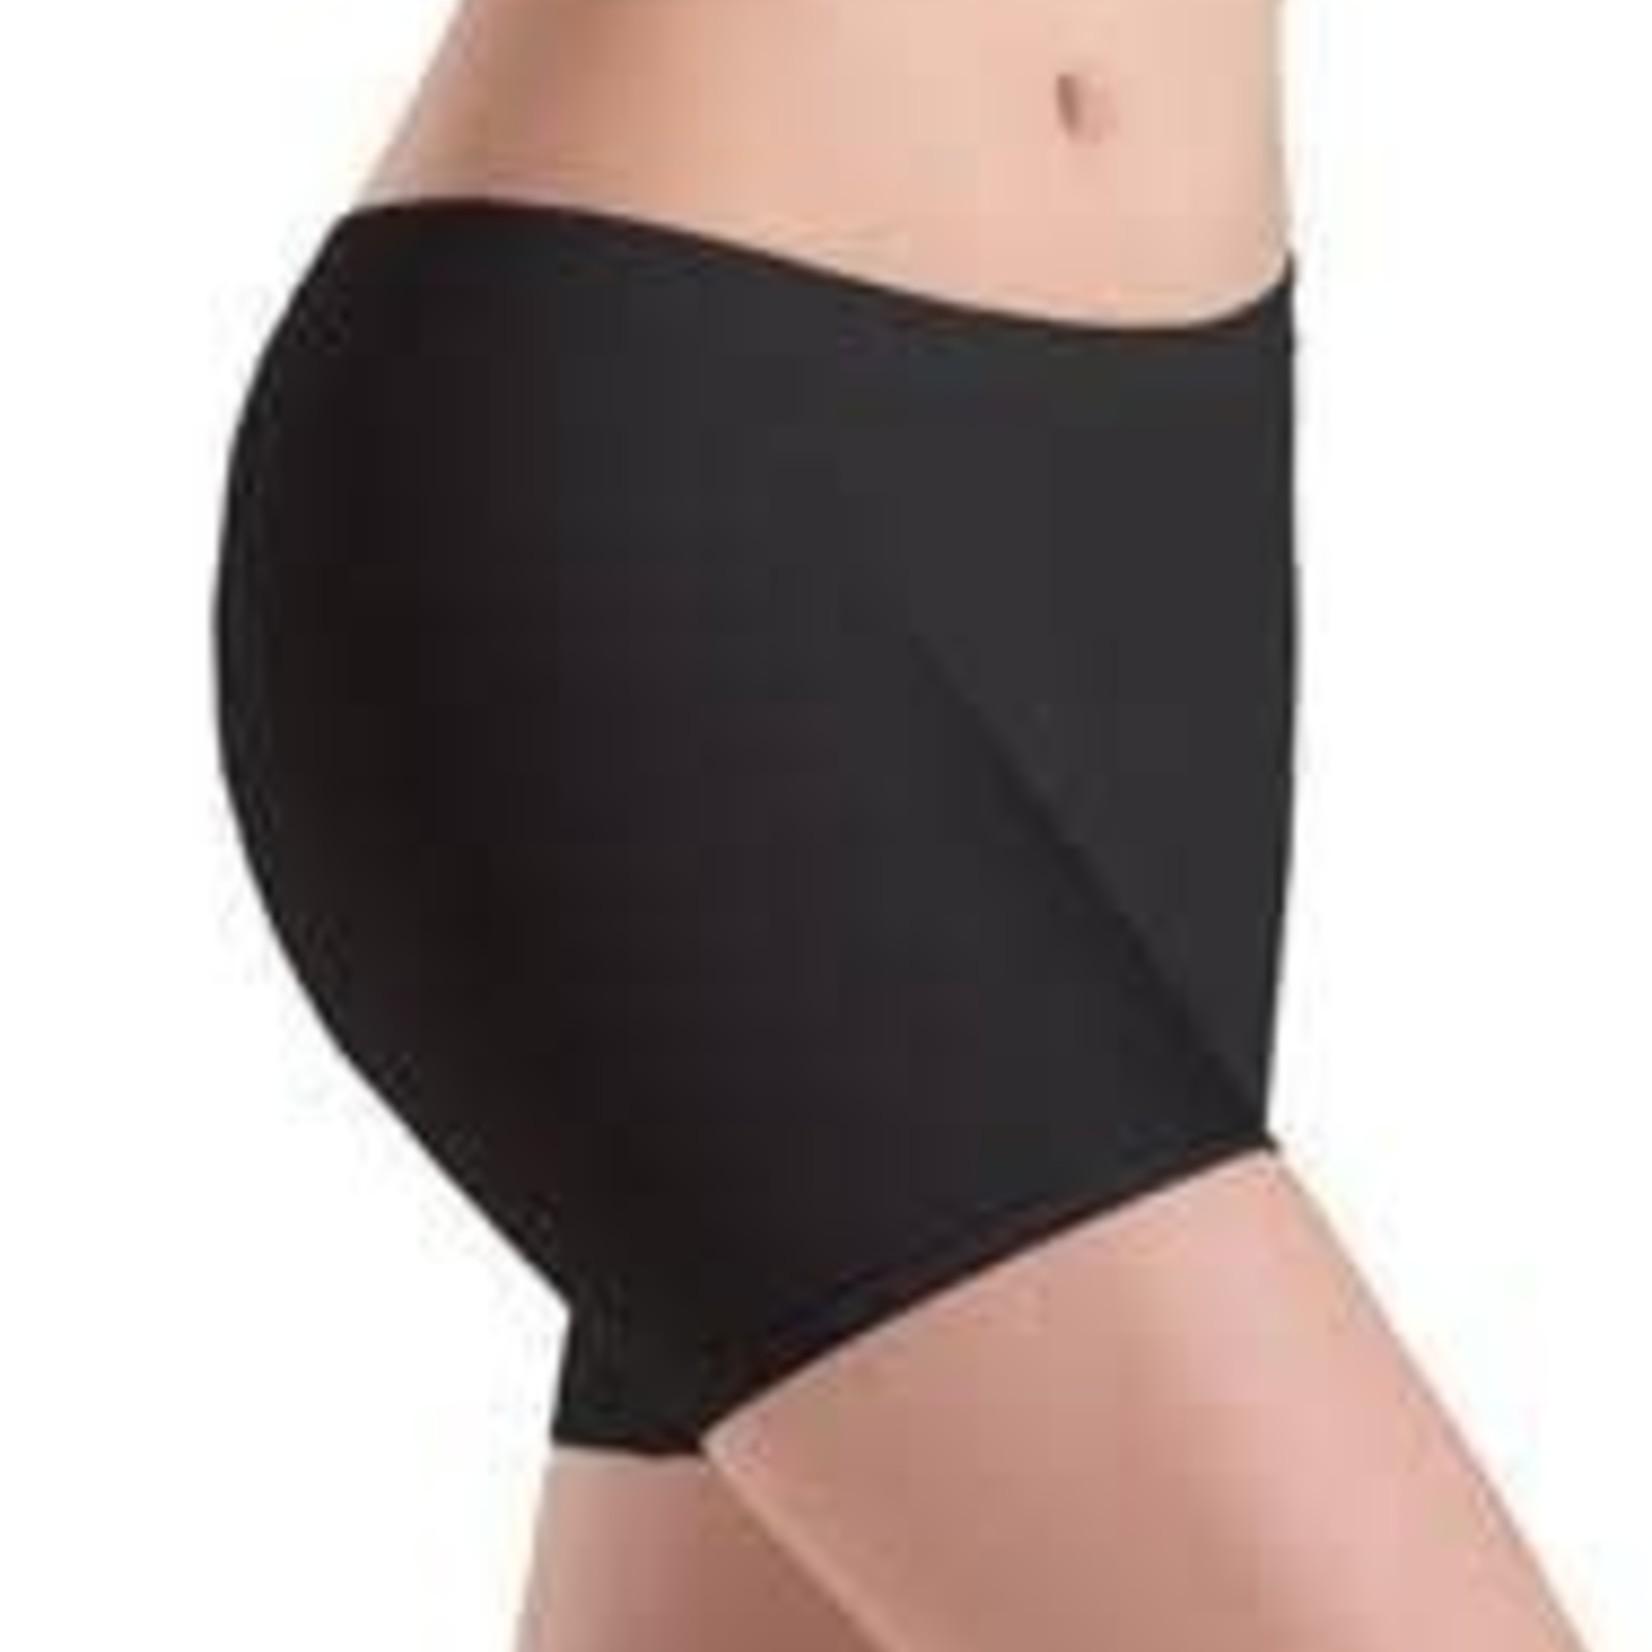 Motionwear Motionwear 7917 Adult/Child Low Rise Shorts